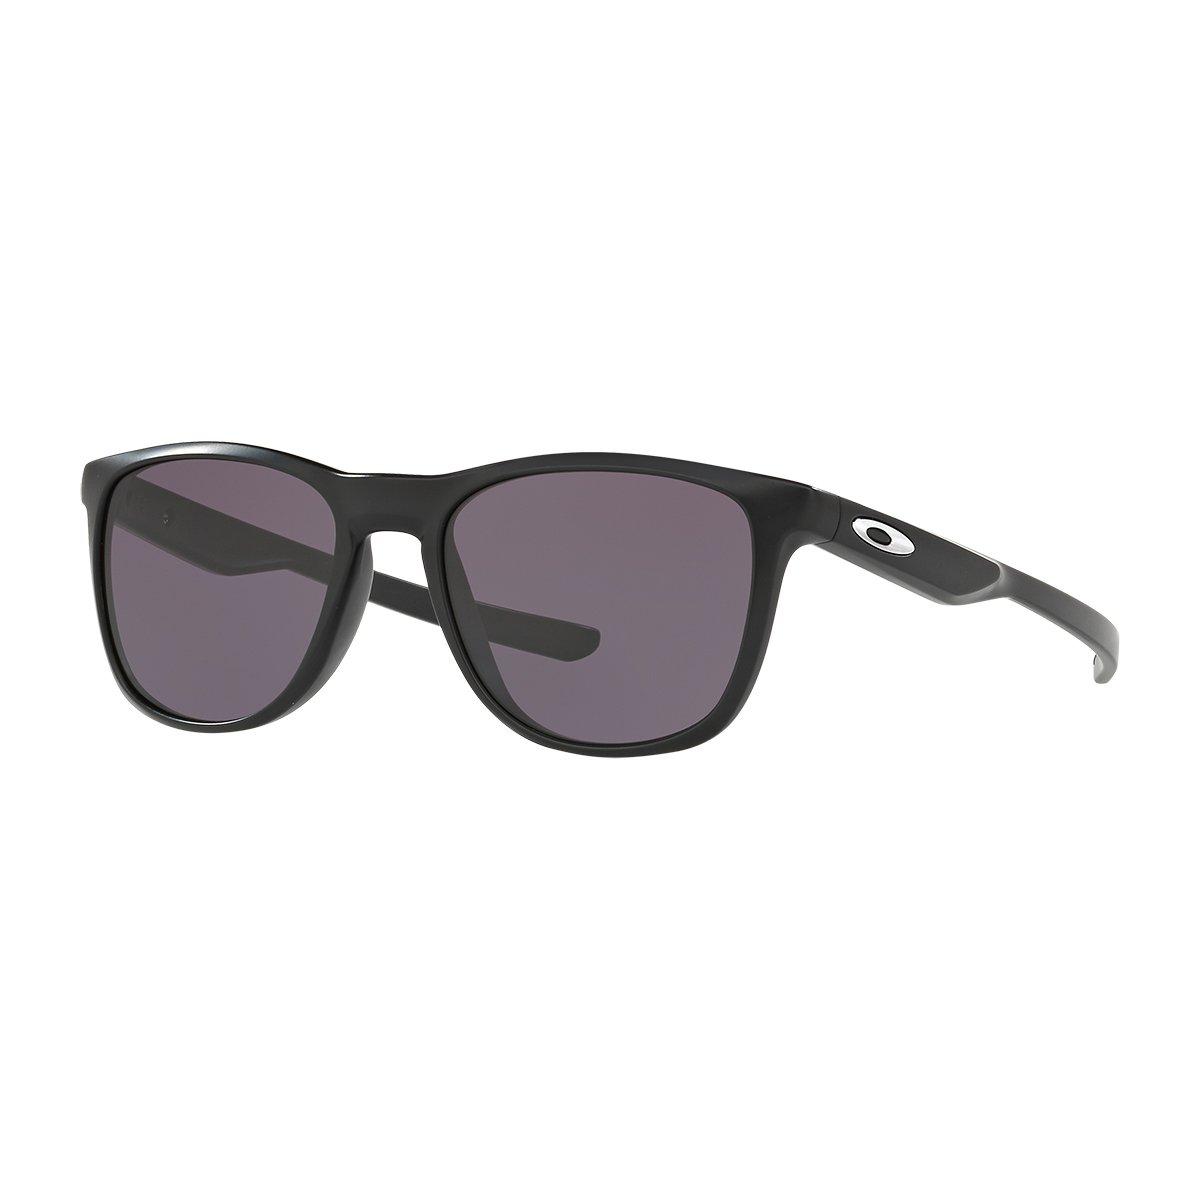 Oakley Men's Trillbe X Rectangular Sunglasses MATTE BLACK 52 mm